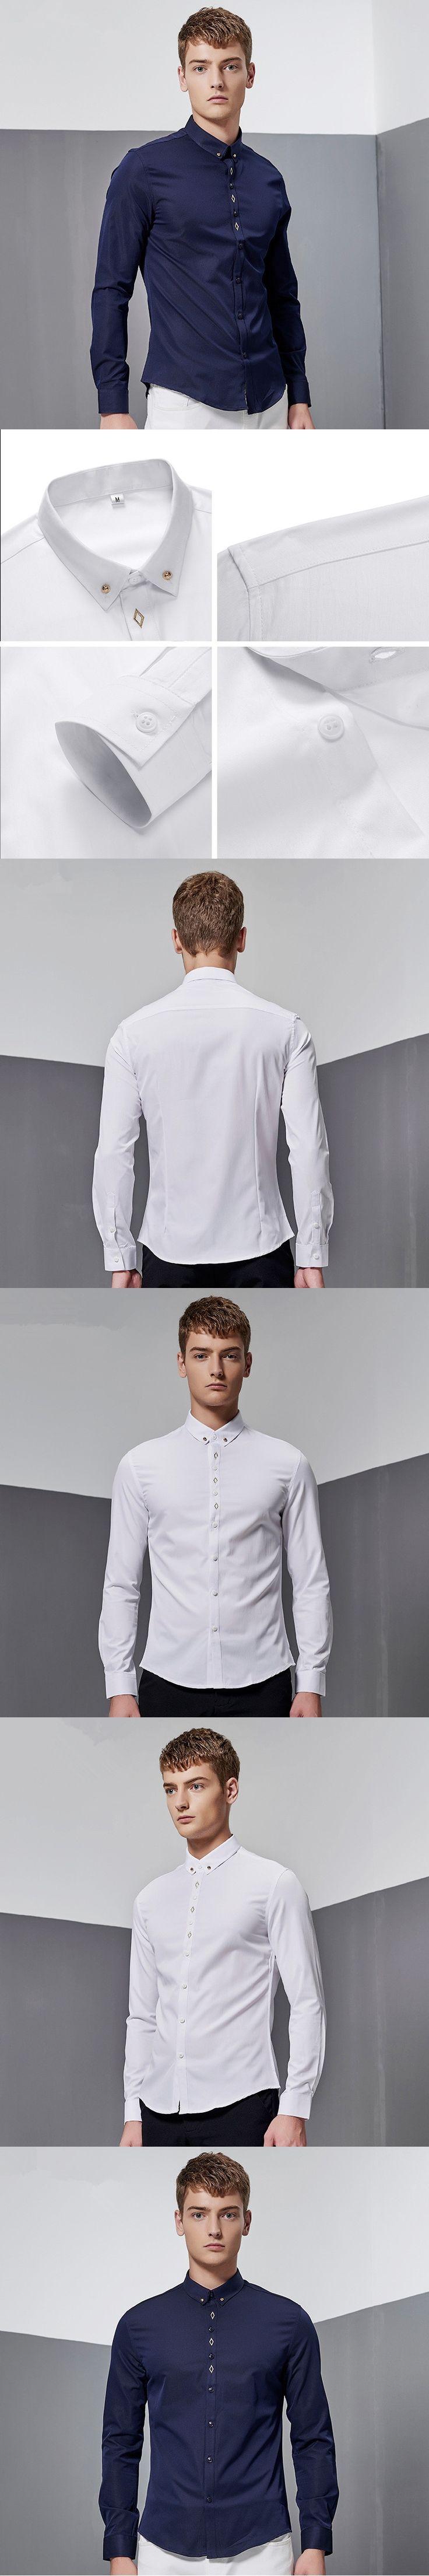 New Men's Brand Clothing Autumn Denim Shirt Men Long Sleeve Striped Shirts Men Slim Fit Casual Male Social Dress Shirt Clothes